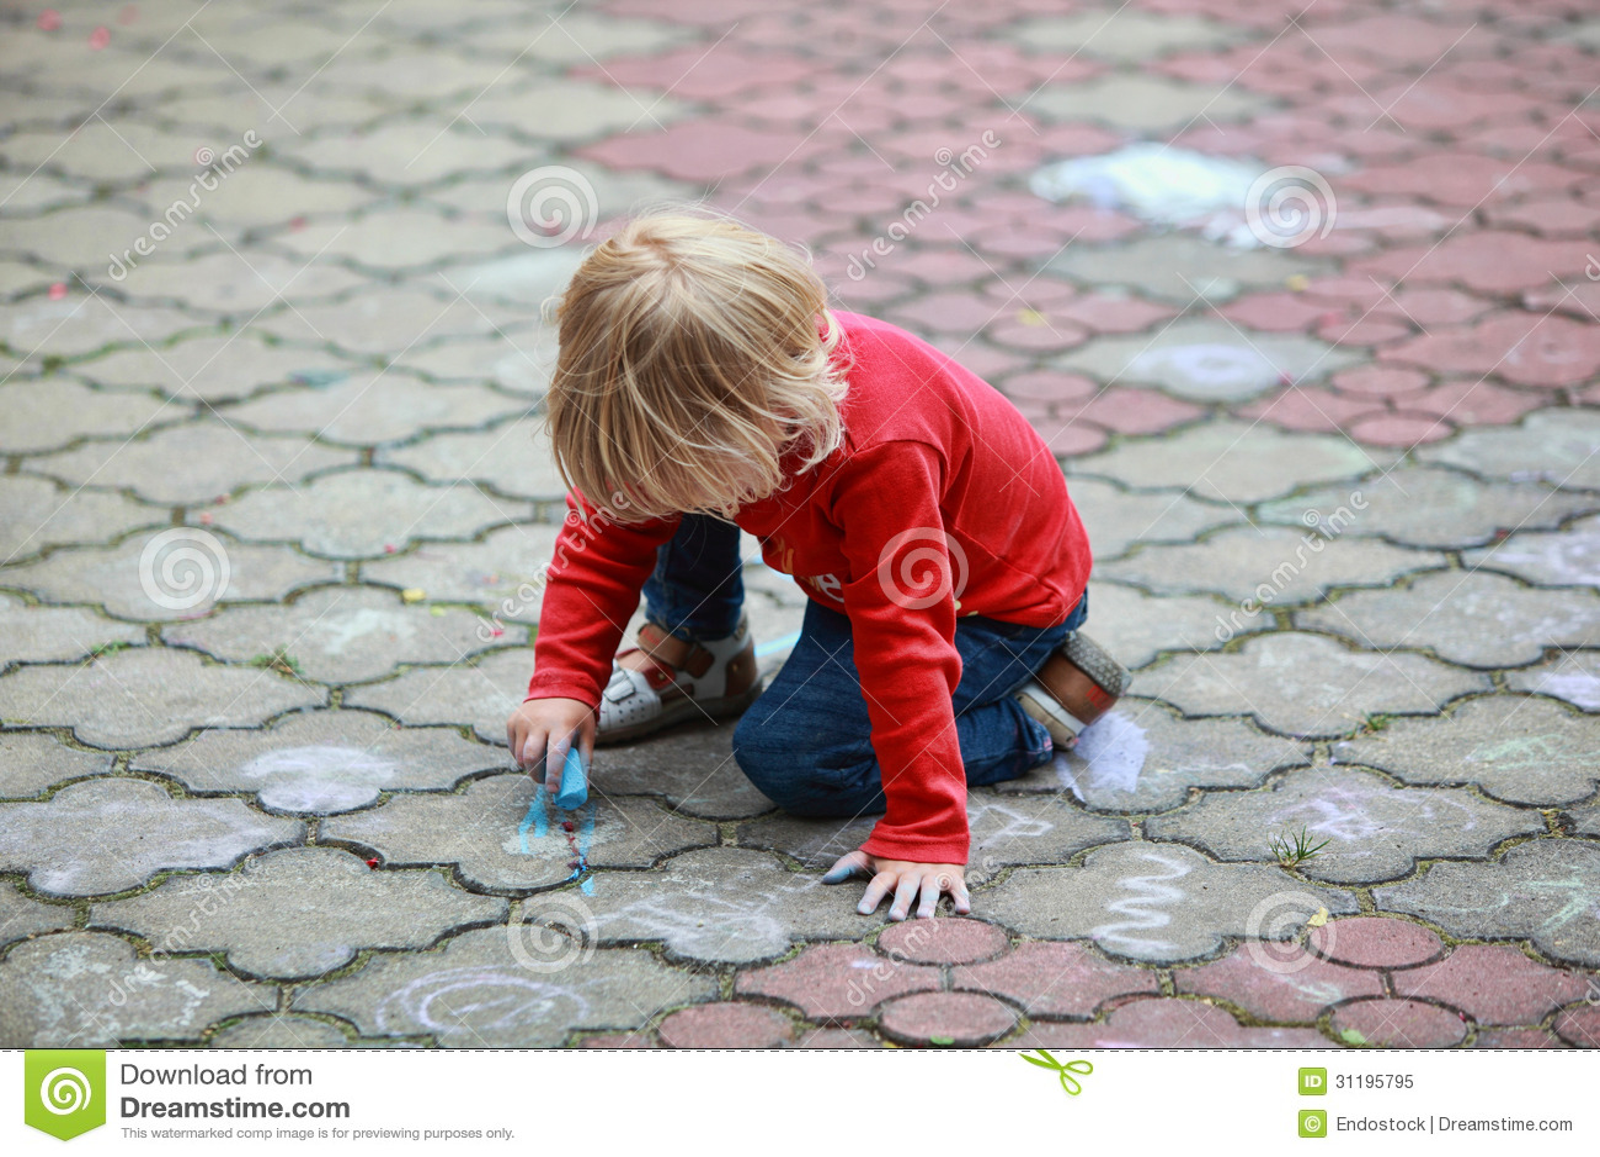 Dessin d 39 enfant avec la craie image stock image du - Image dessin enfant ...